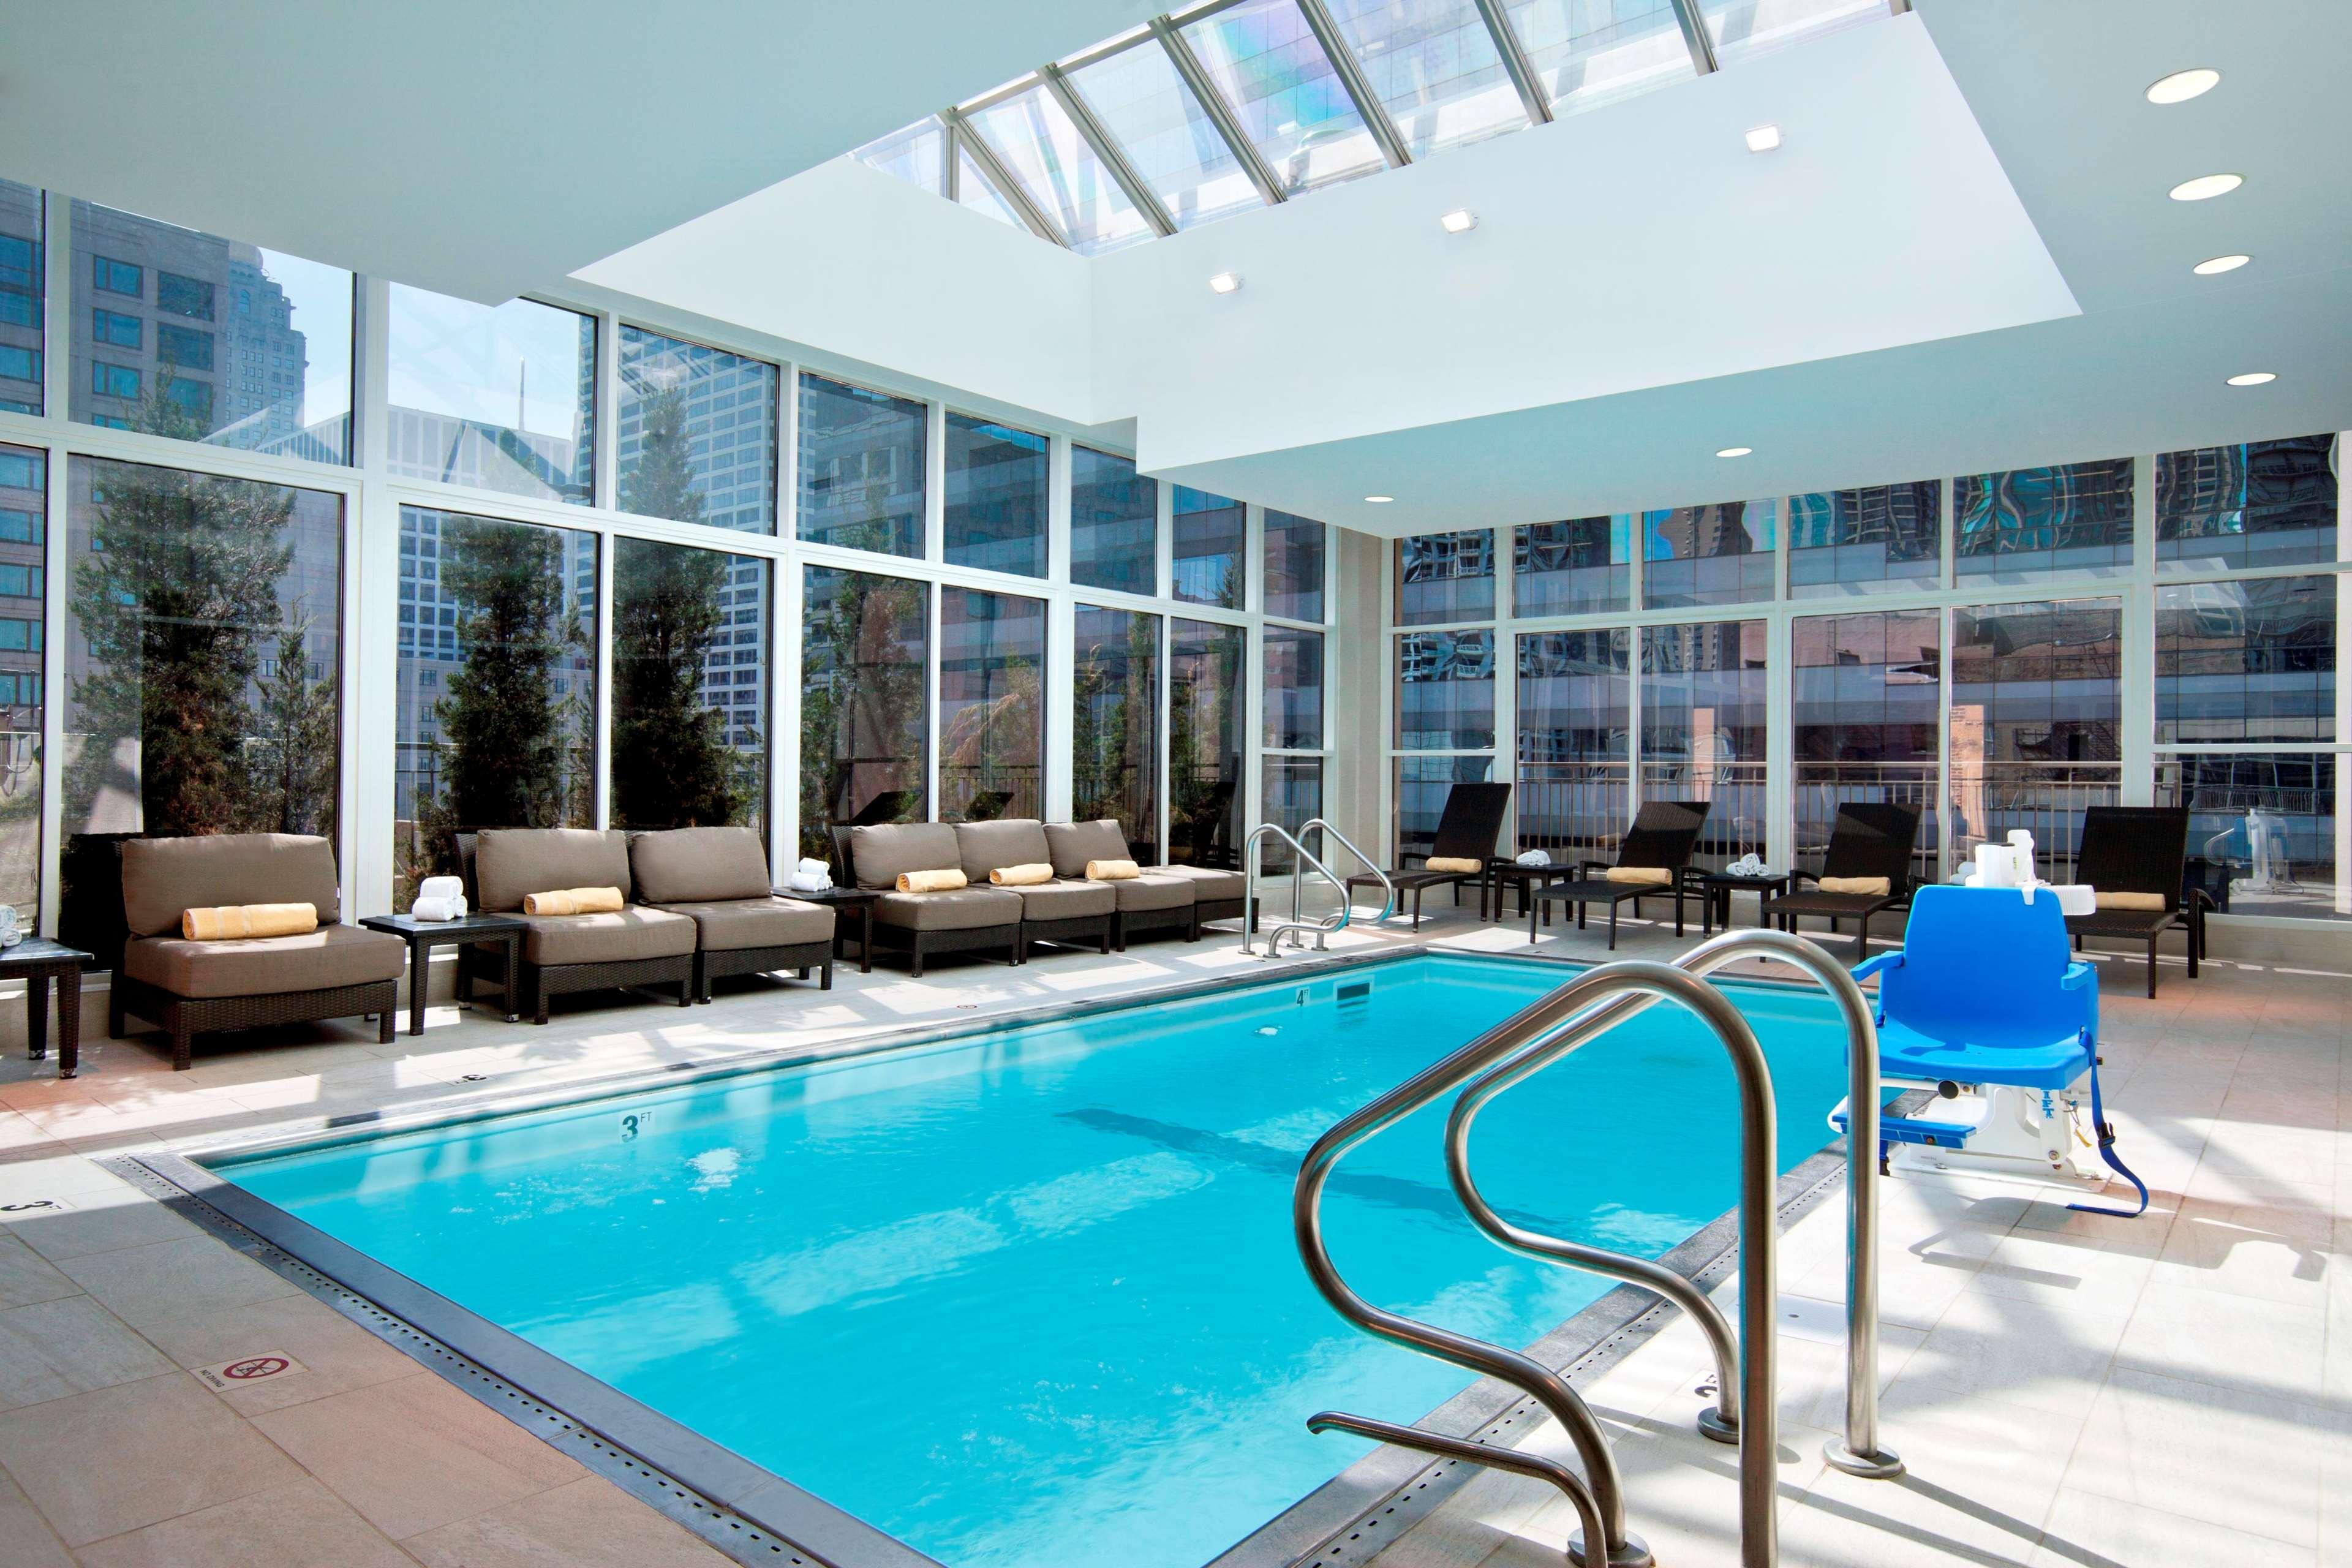 Hilton Garden Inn Chicago Downtown/Magnificent Mile image 7